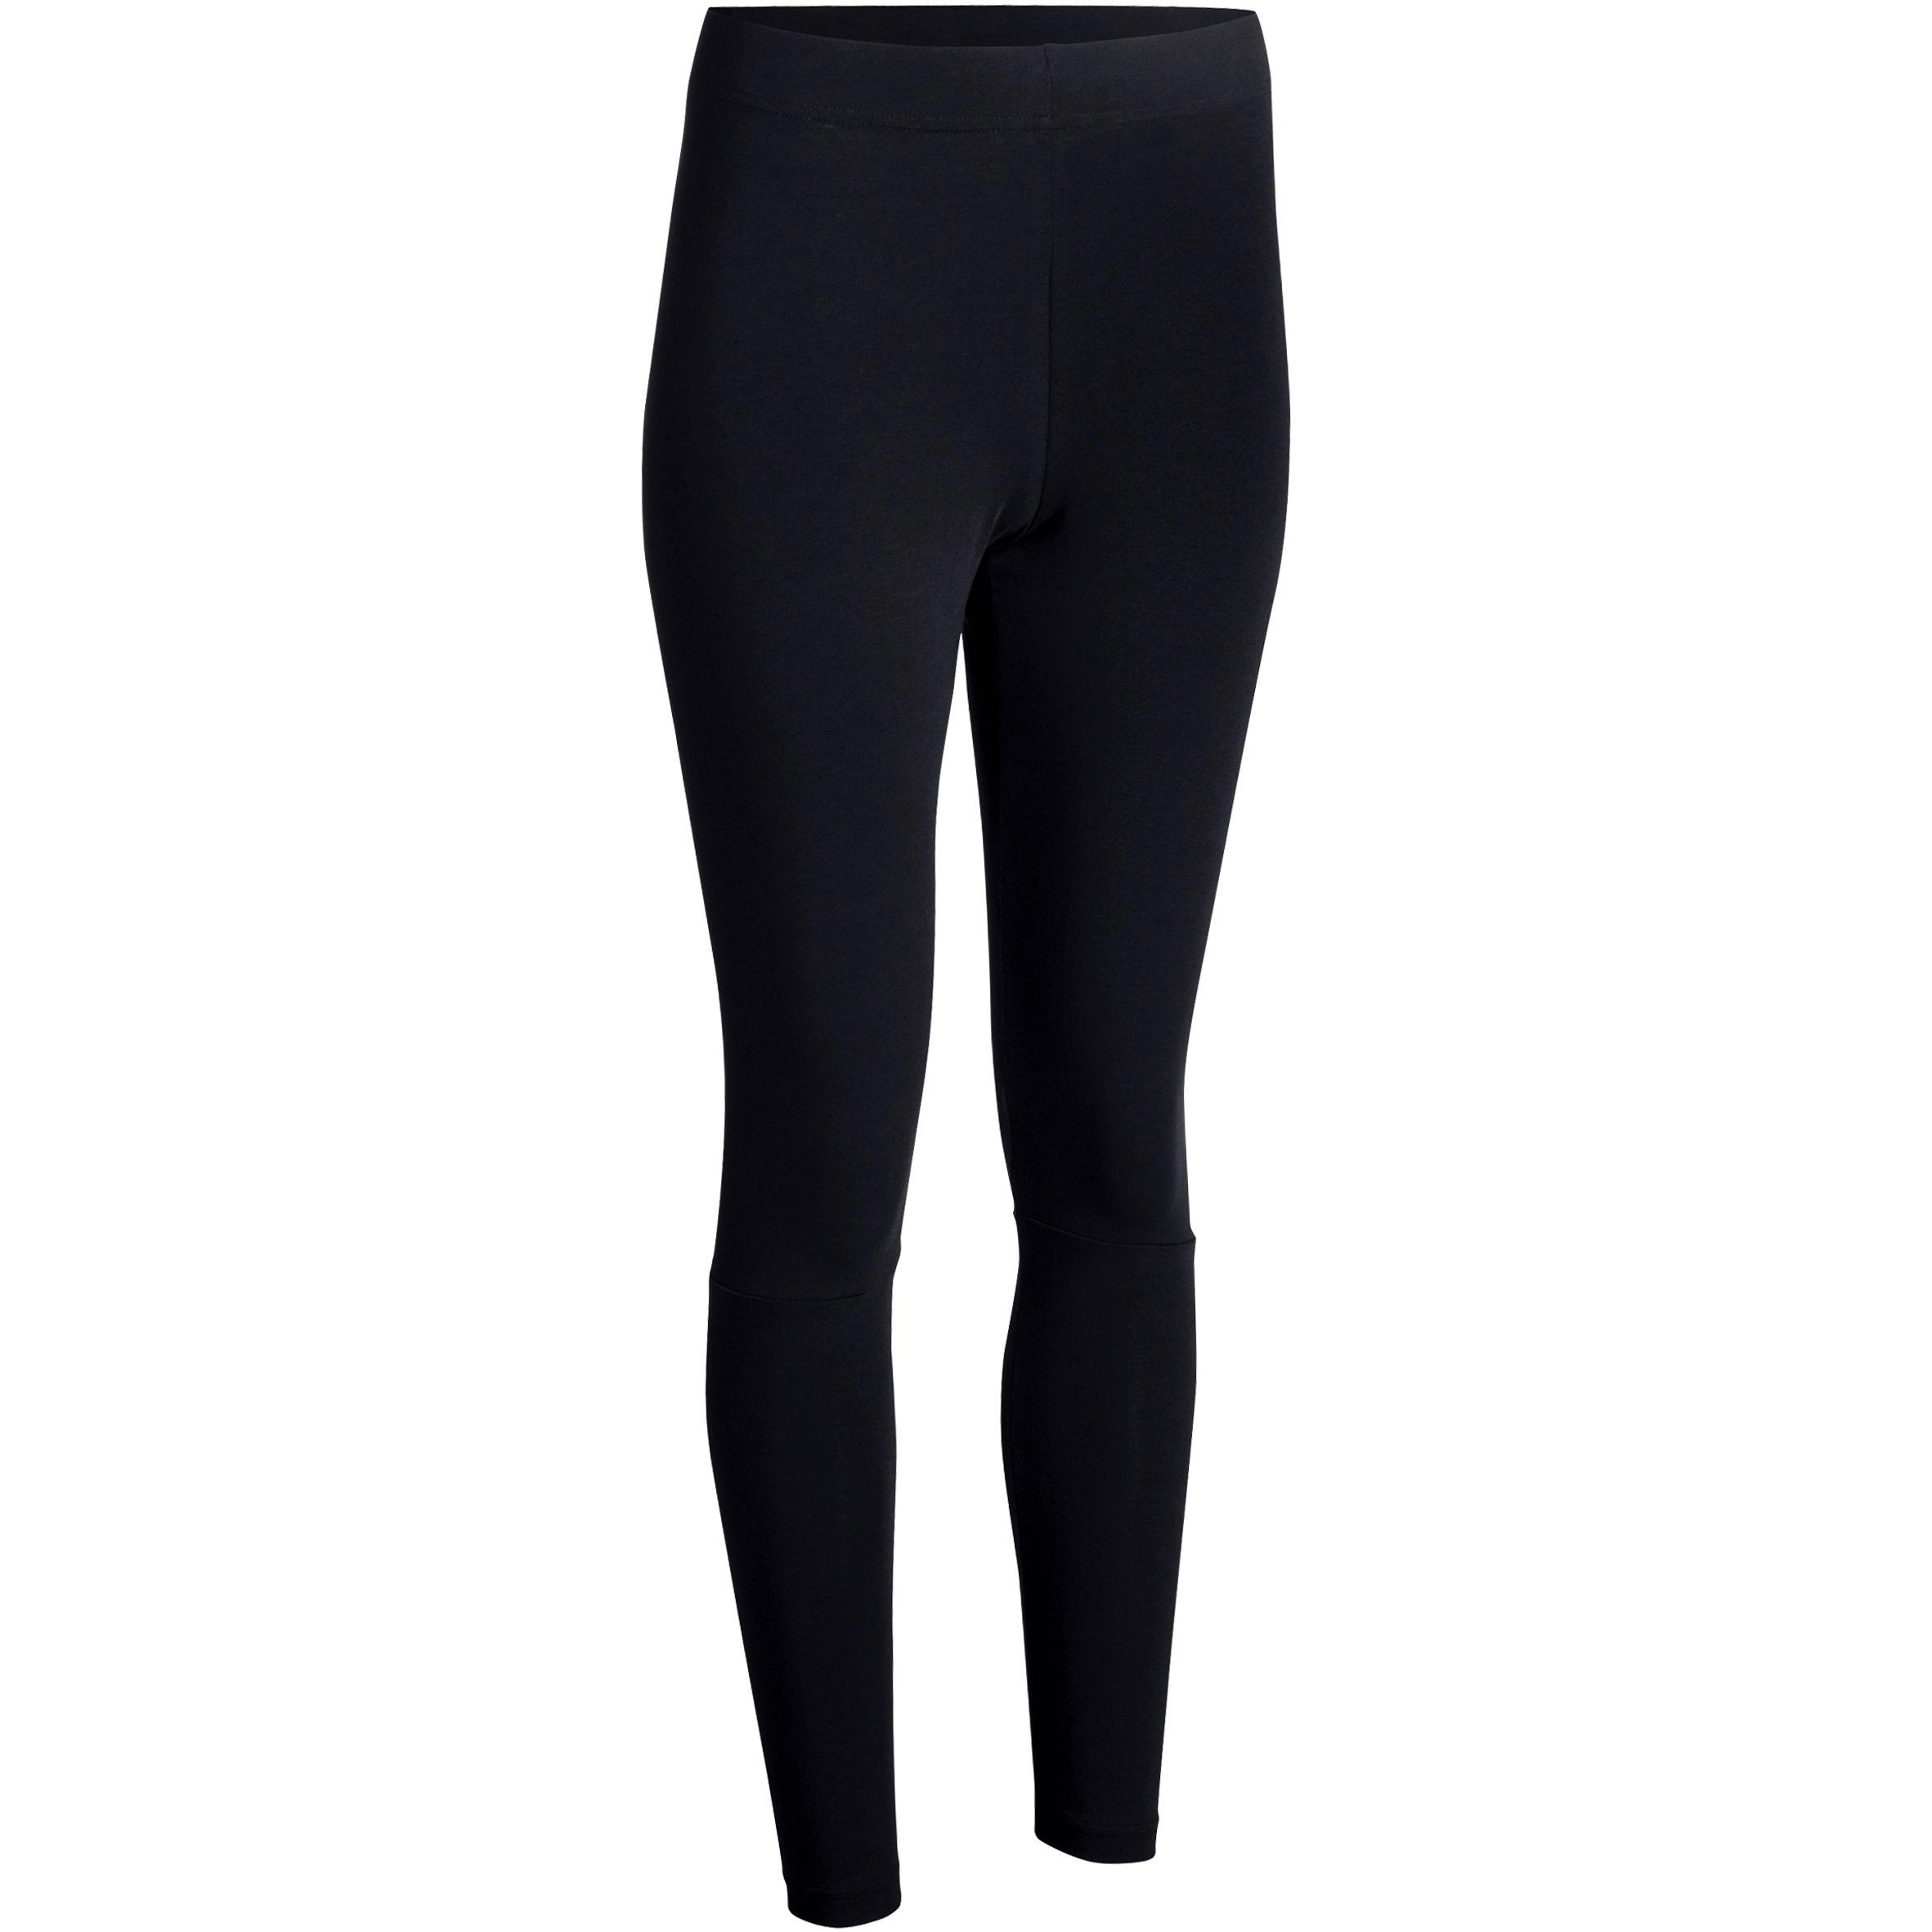 Legging Adidas Gym 500 Noir Femme Slim Stretching lFKc1J